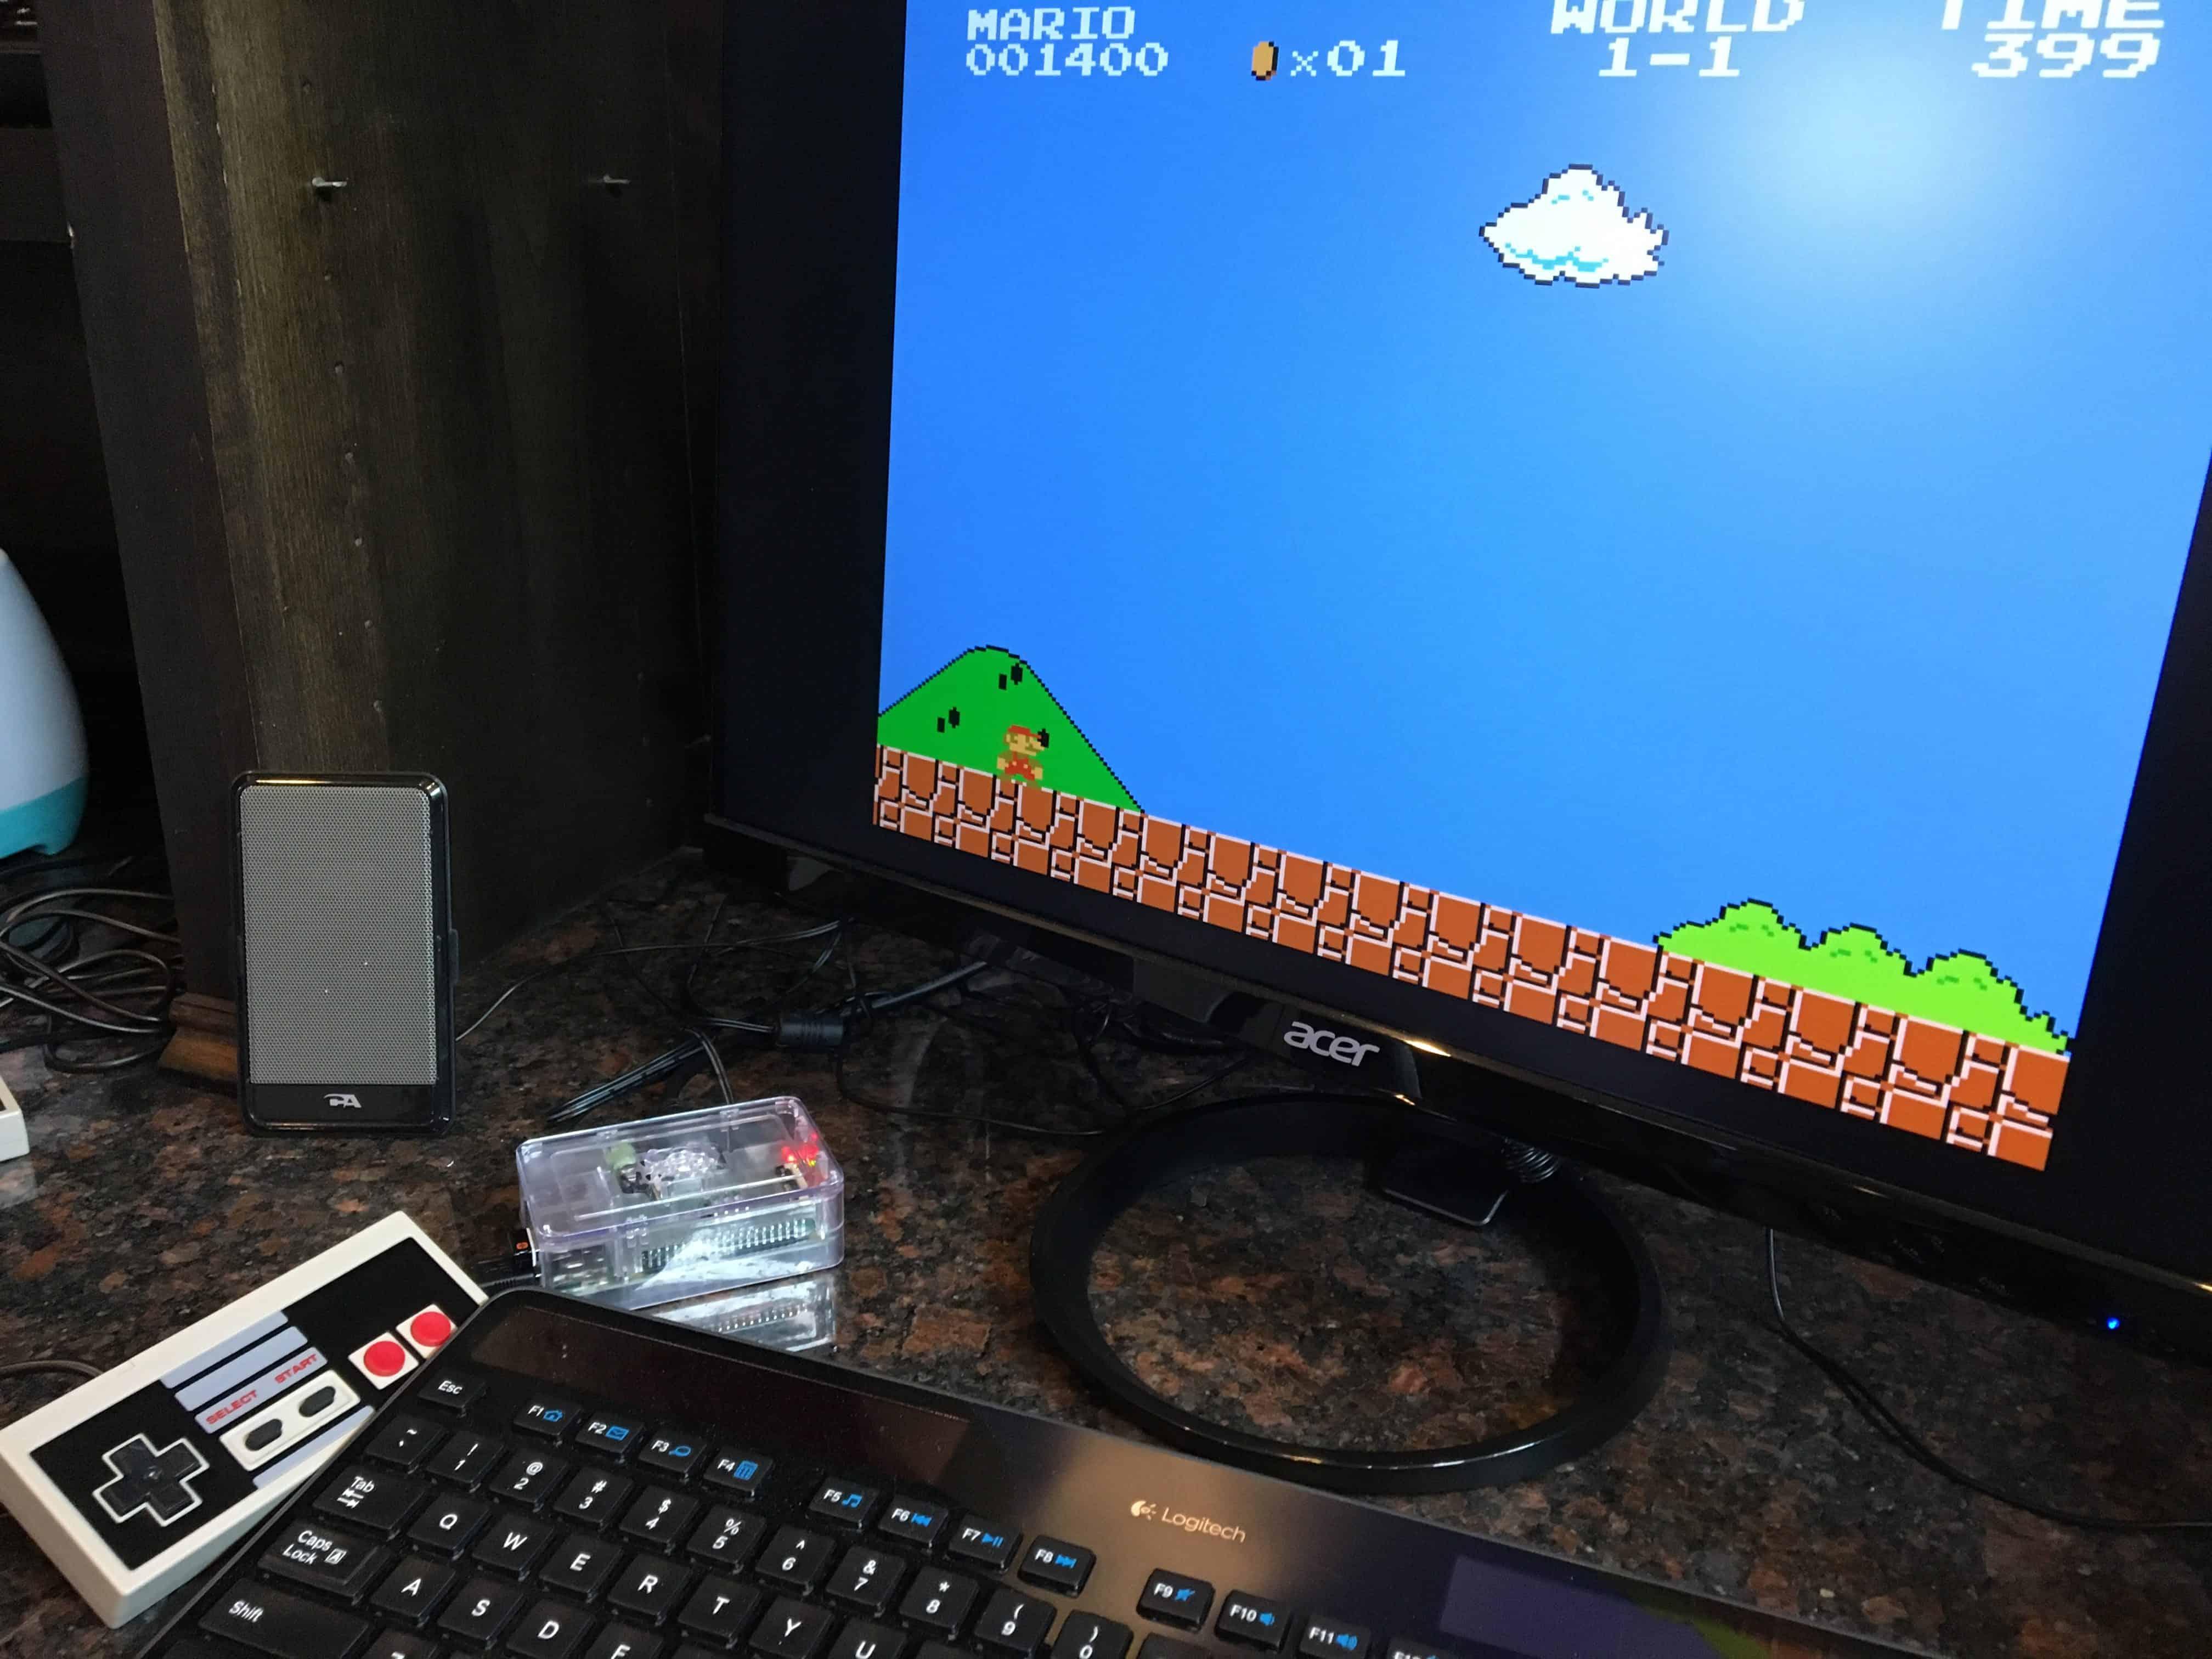 Setting up RetroPie on a Raspberry Pi 3 - The Geek Pub